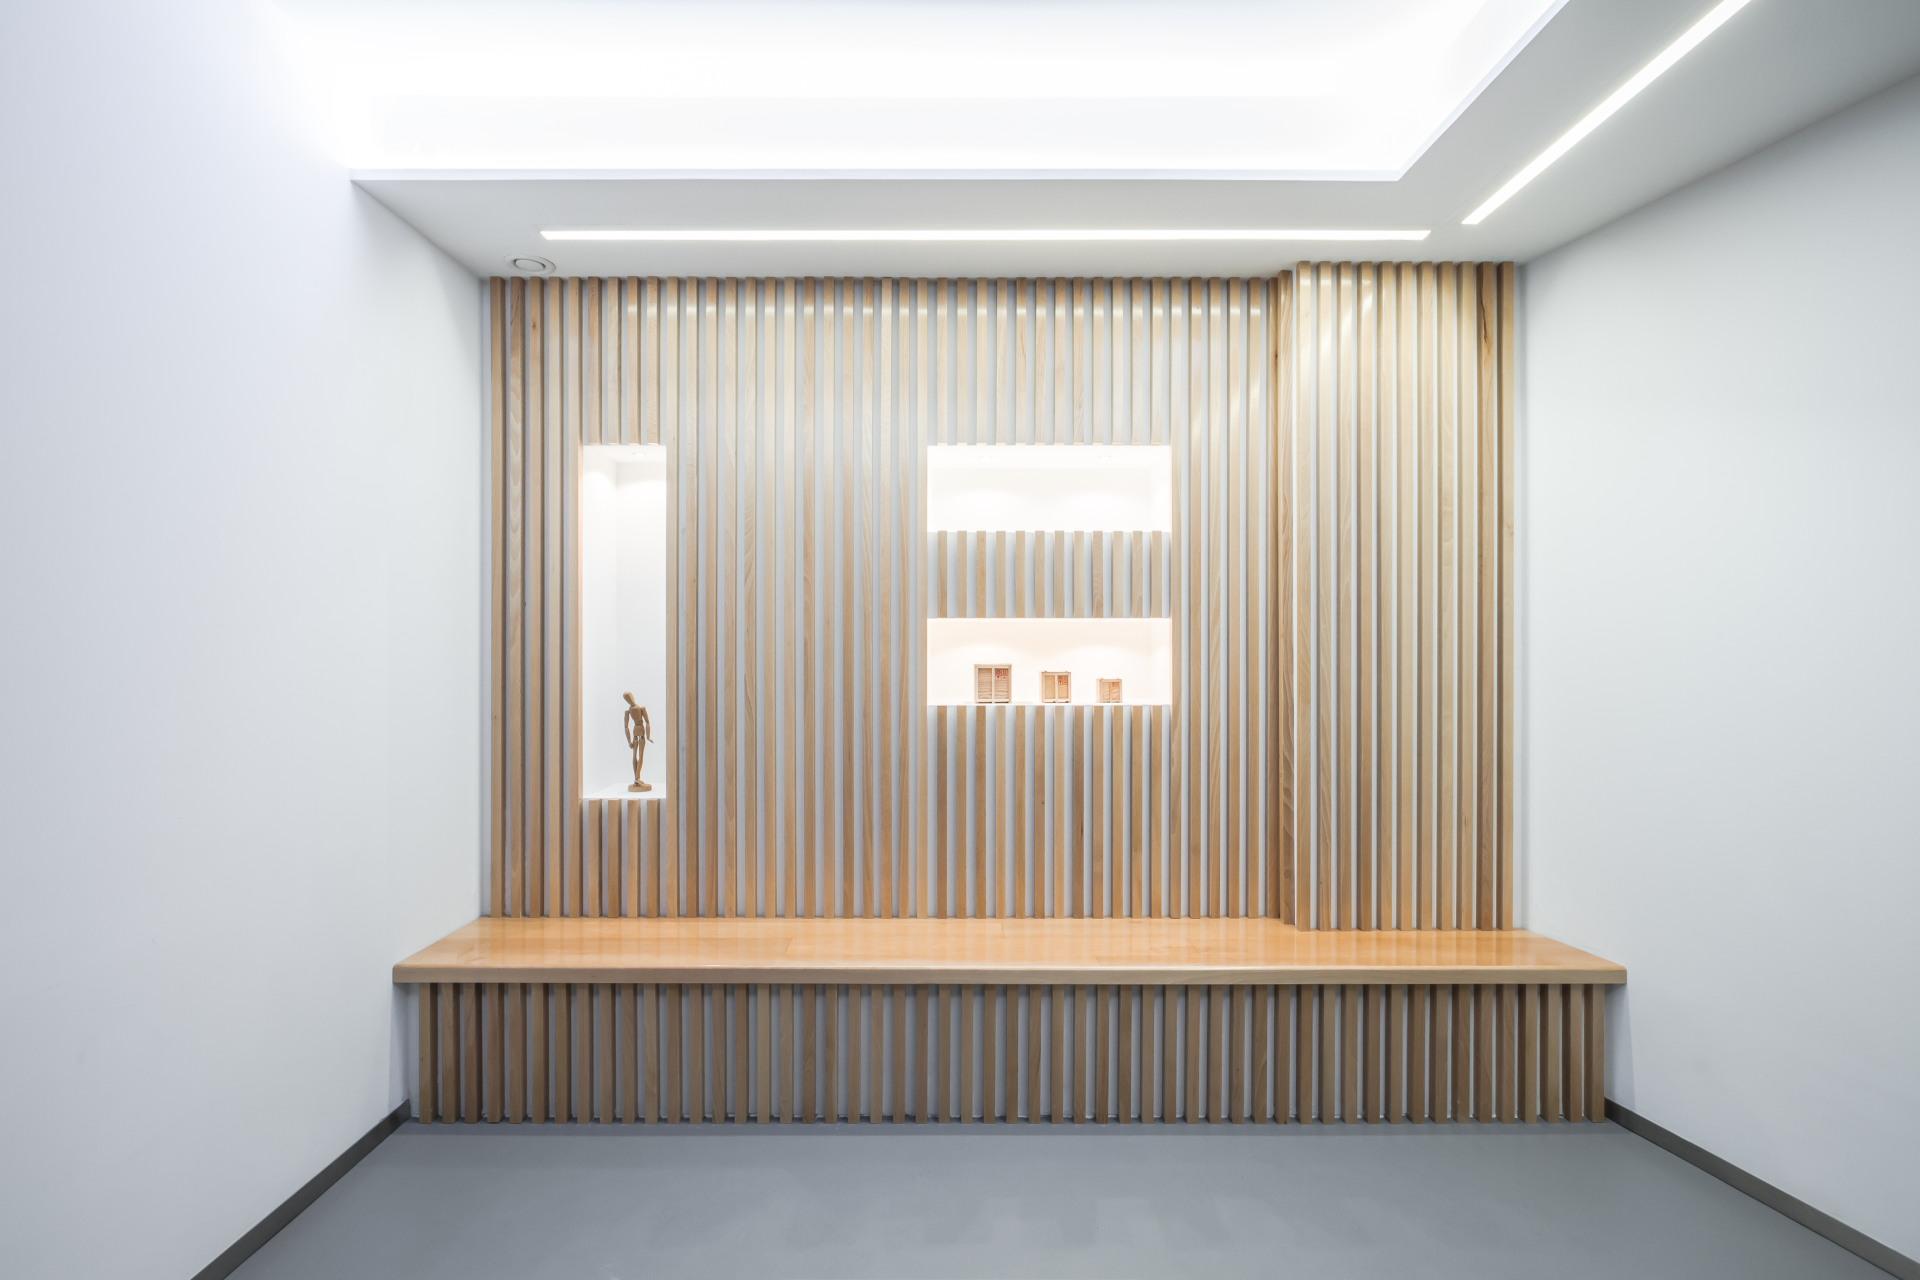 fotografia-arquitectura-valencia-german-cabo-hernandez-clinica (4)